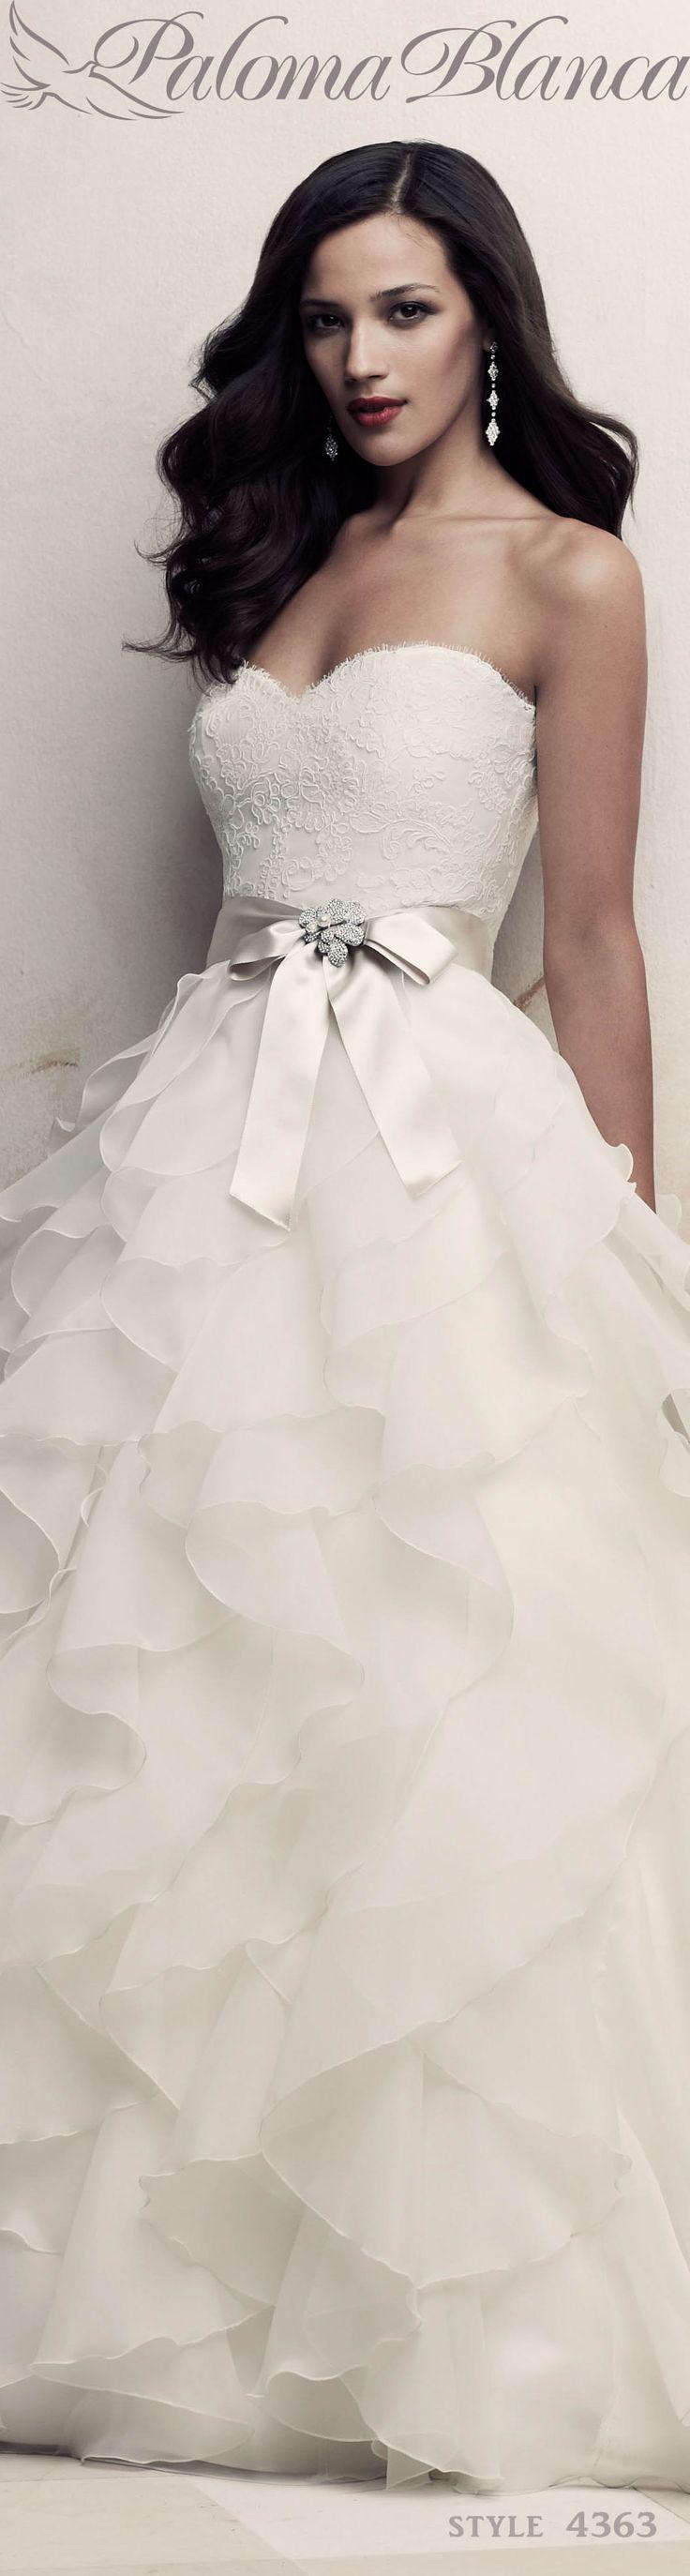 Romantic Ruffled Wedding Dress - Style #4363